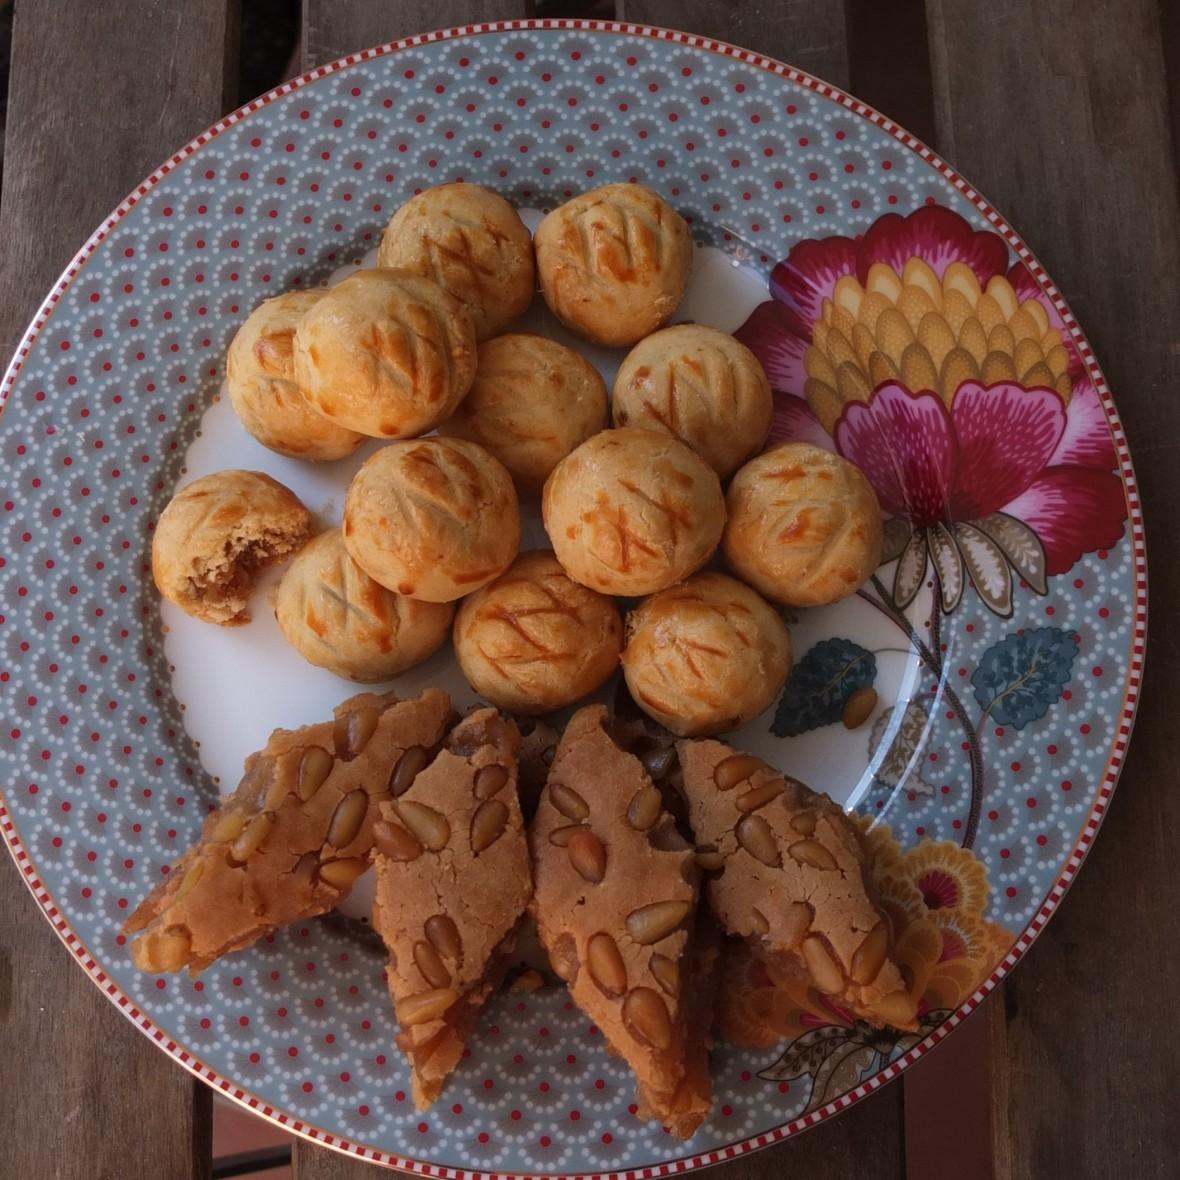 Healthier baked niangao sticky rice cake and glutenfree healthier pineapple tarts